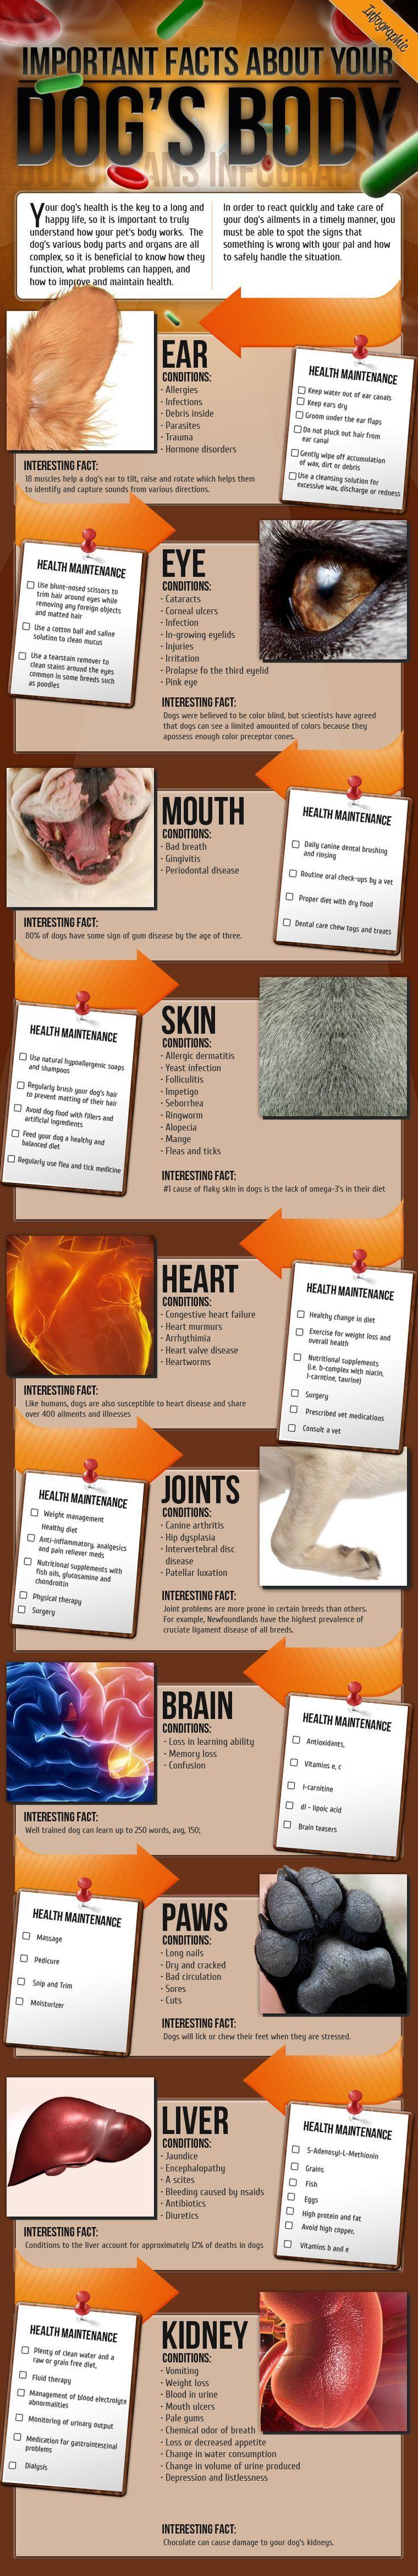 Dog Body Infographic